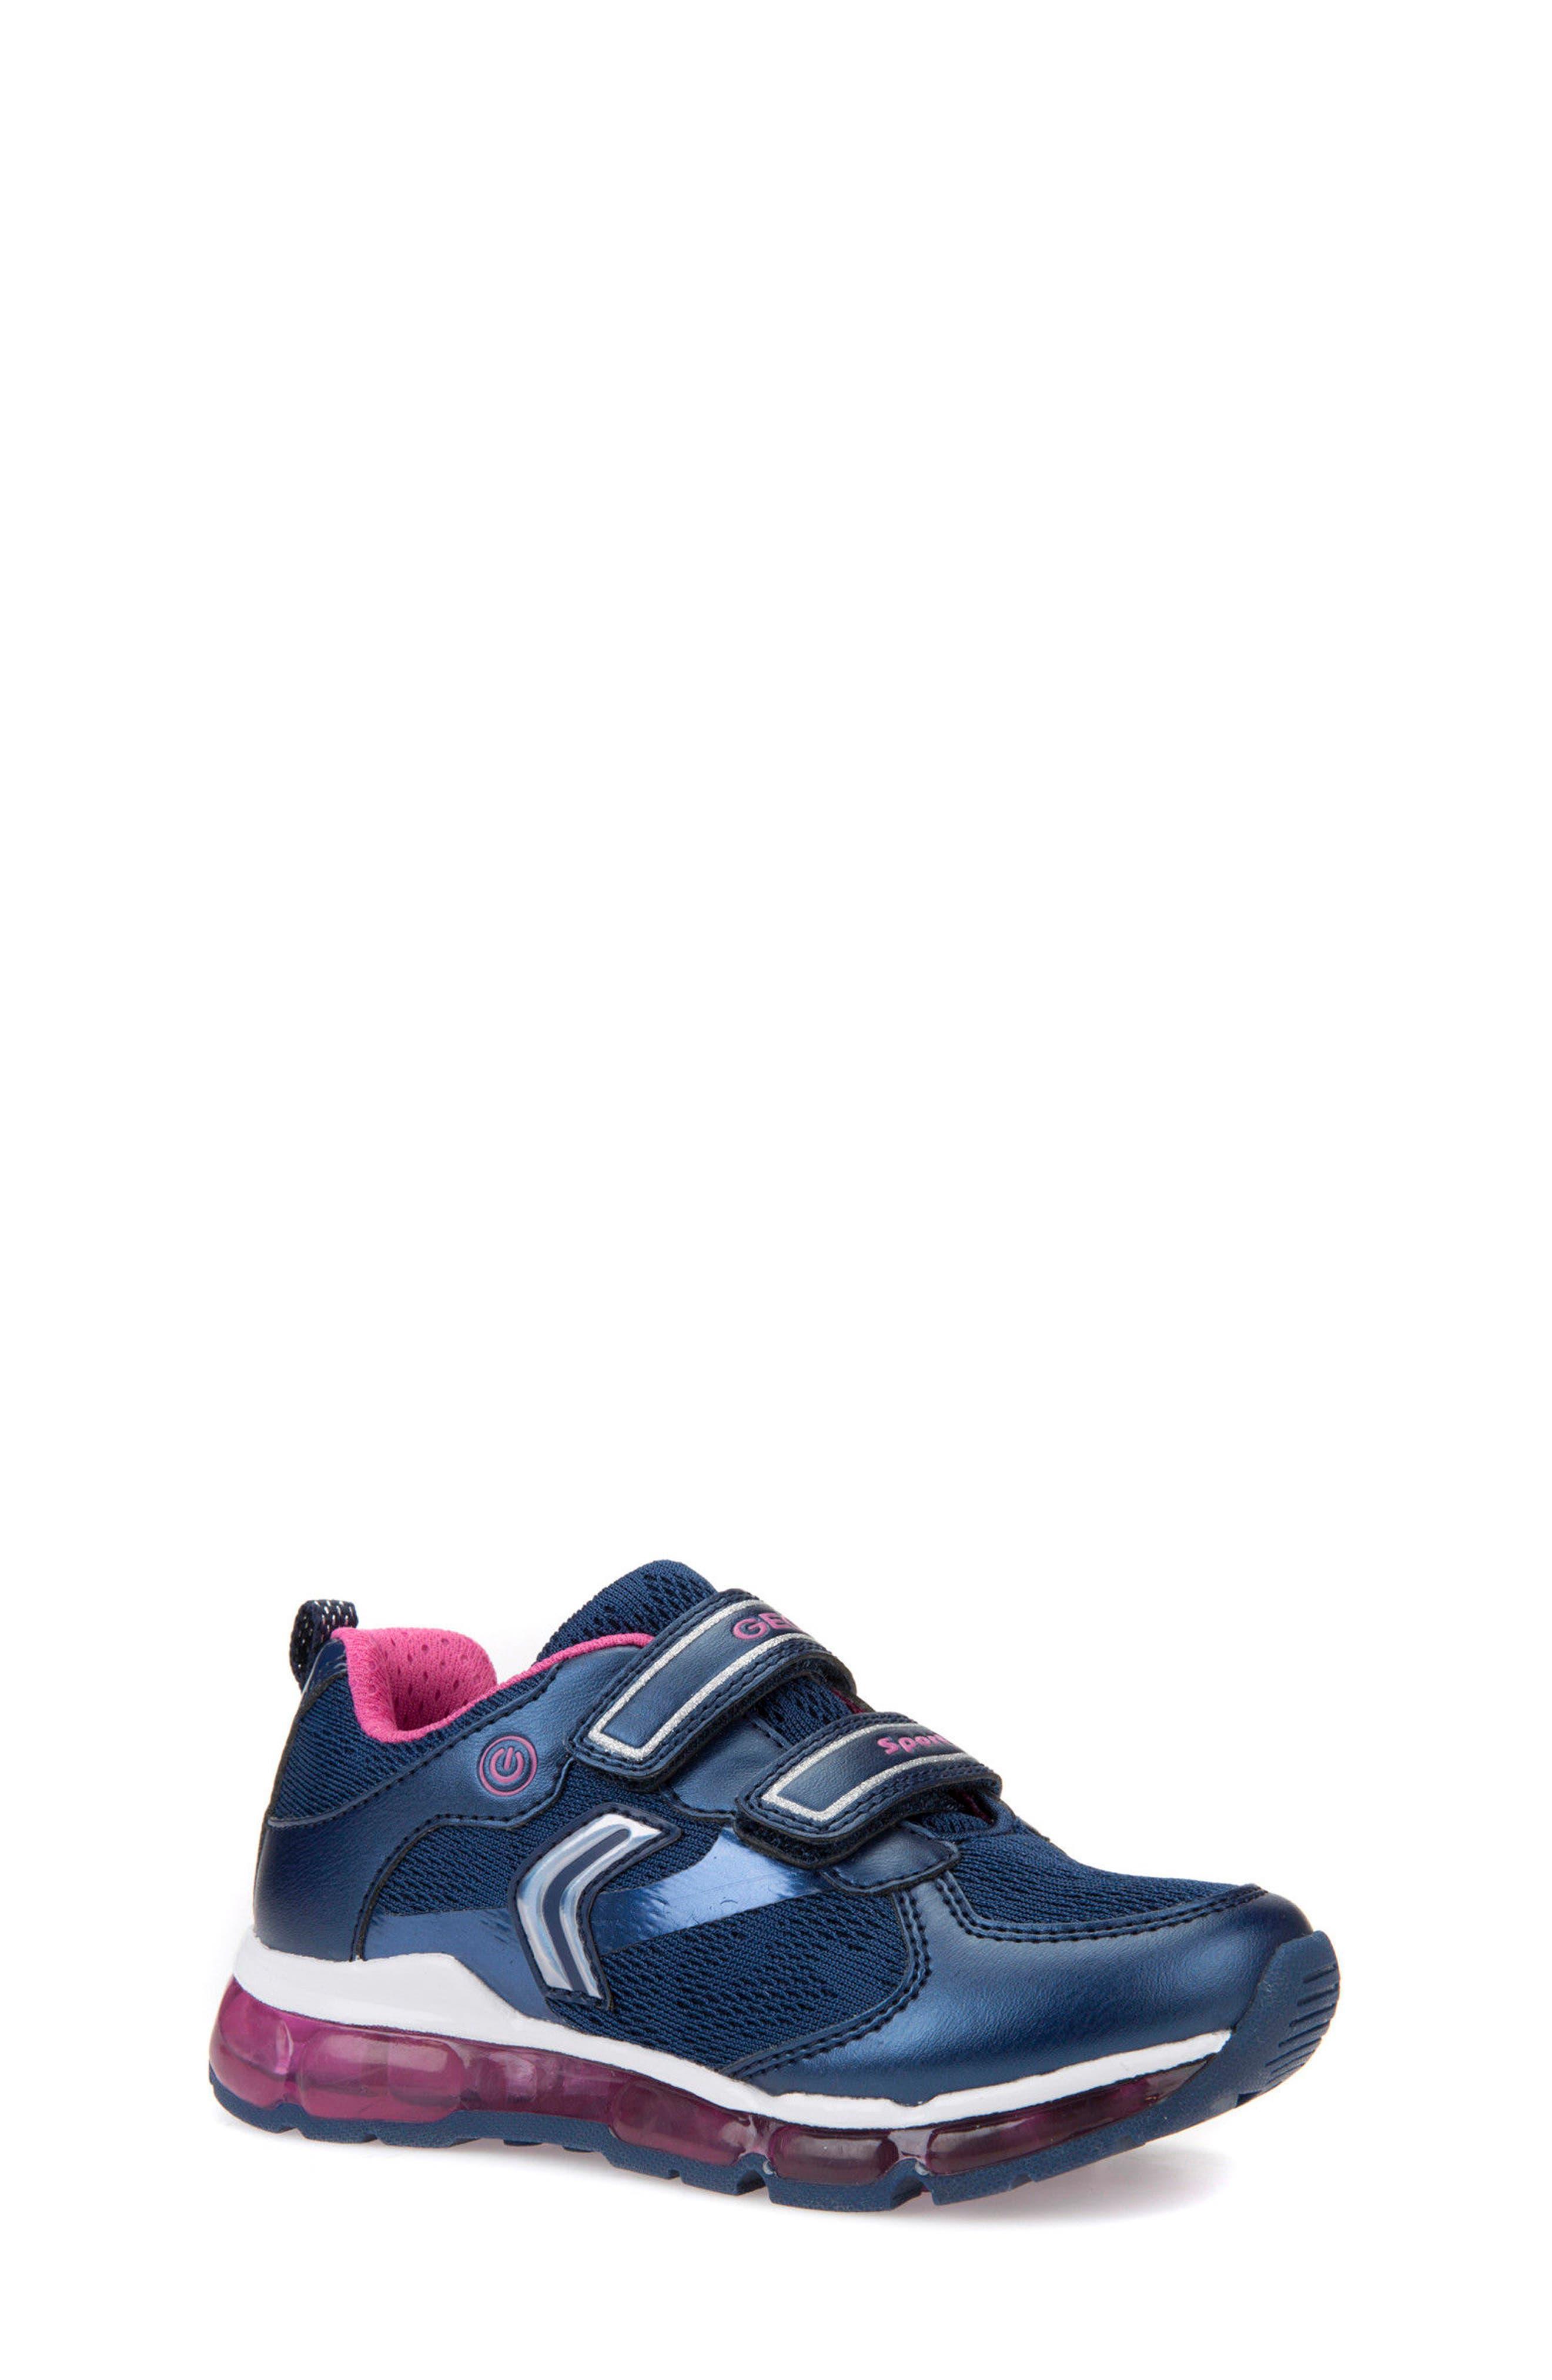 Android Light-Up Sneaker,                             Main thumbnail 1, color,                             Navy/ Fuchsia